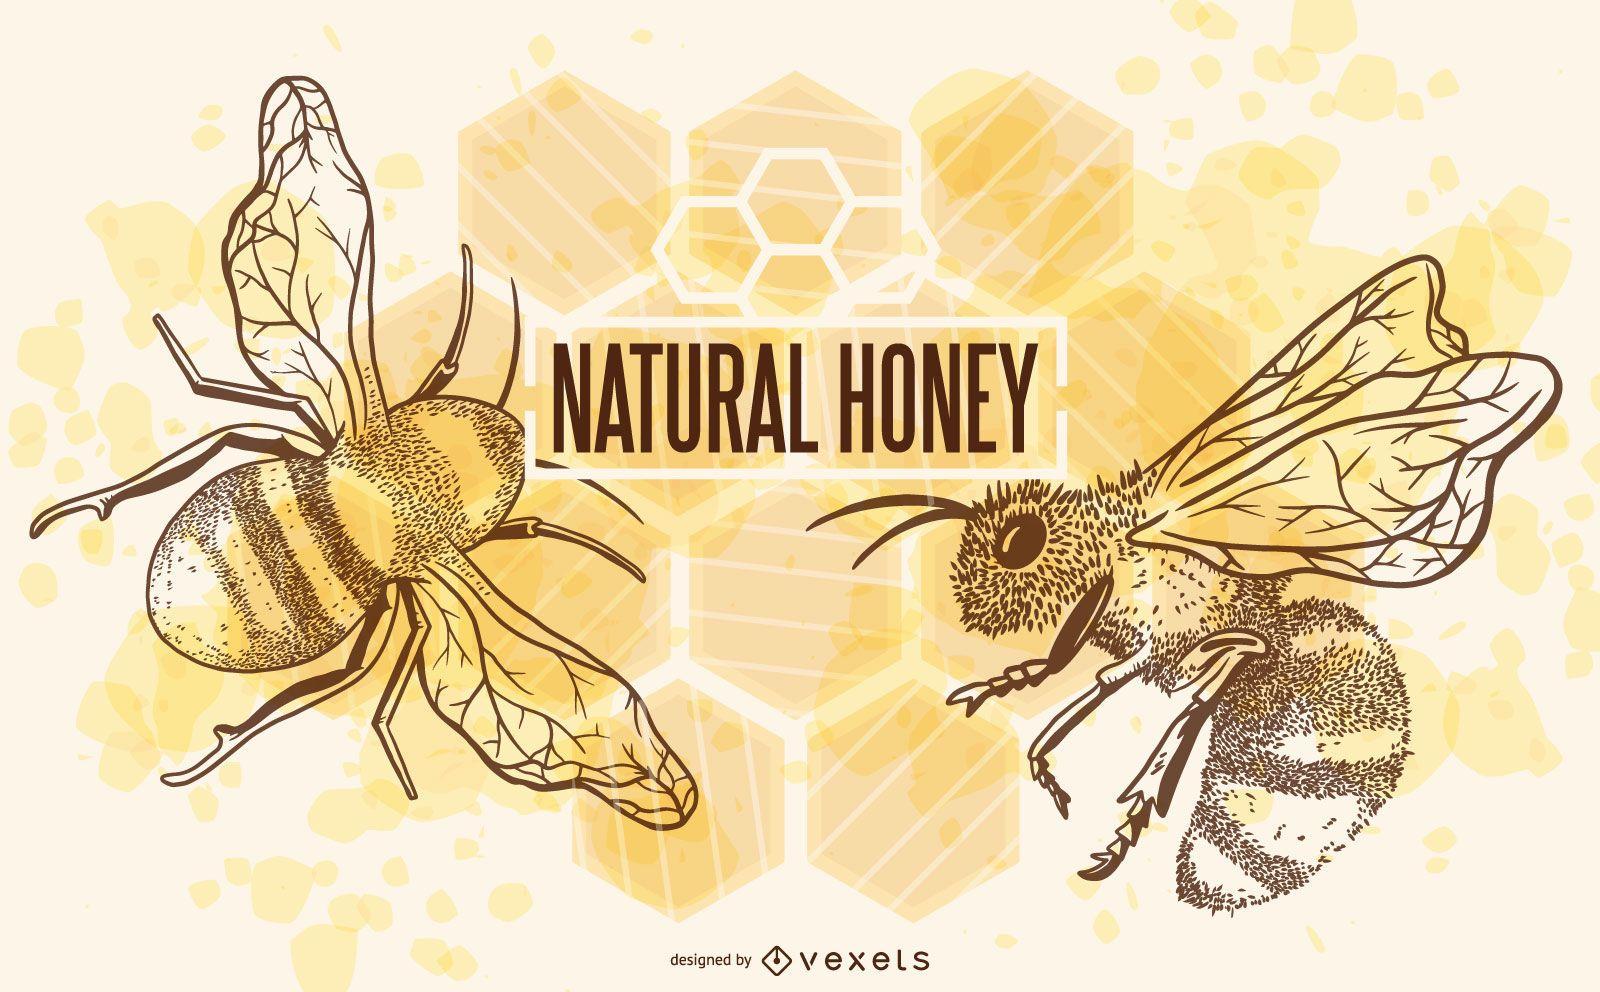 Natural honey bees illustration